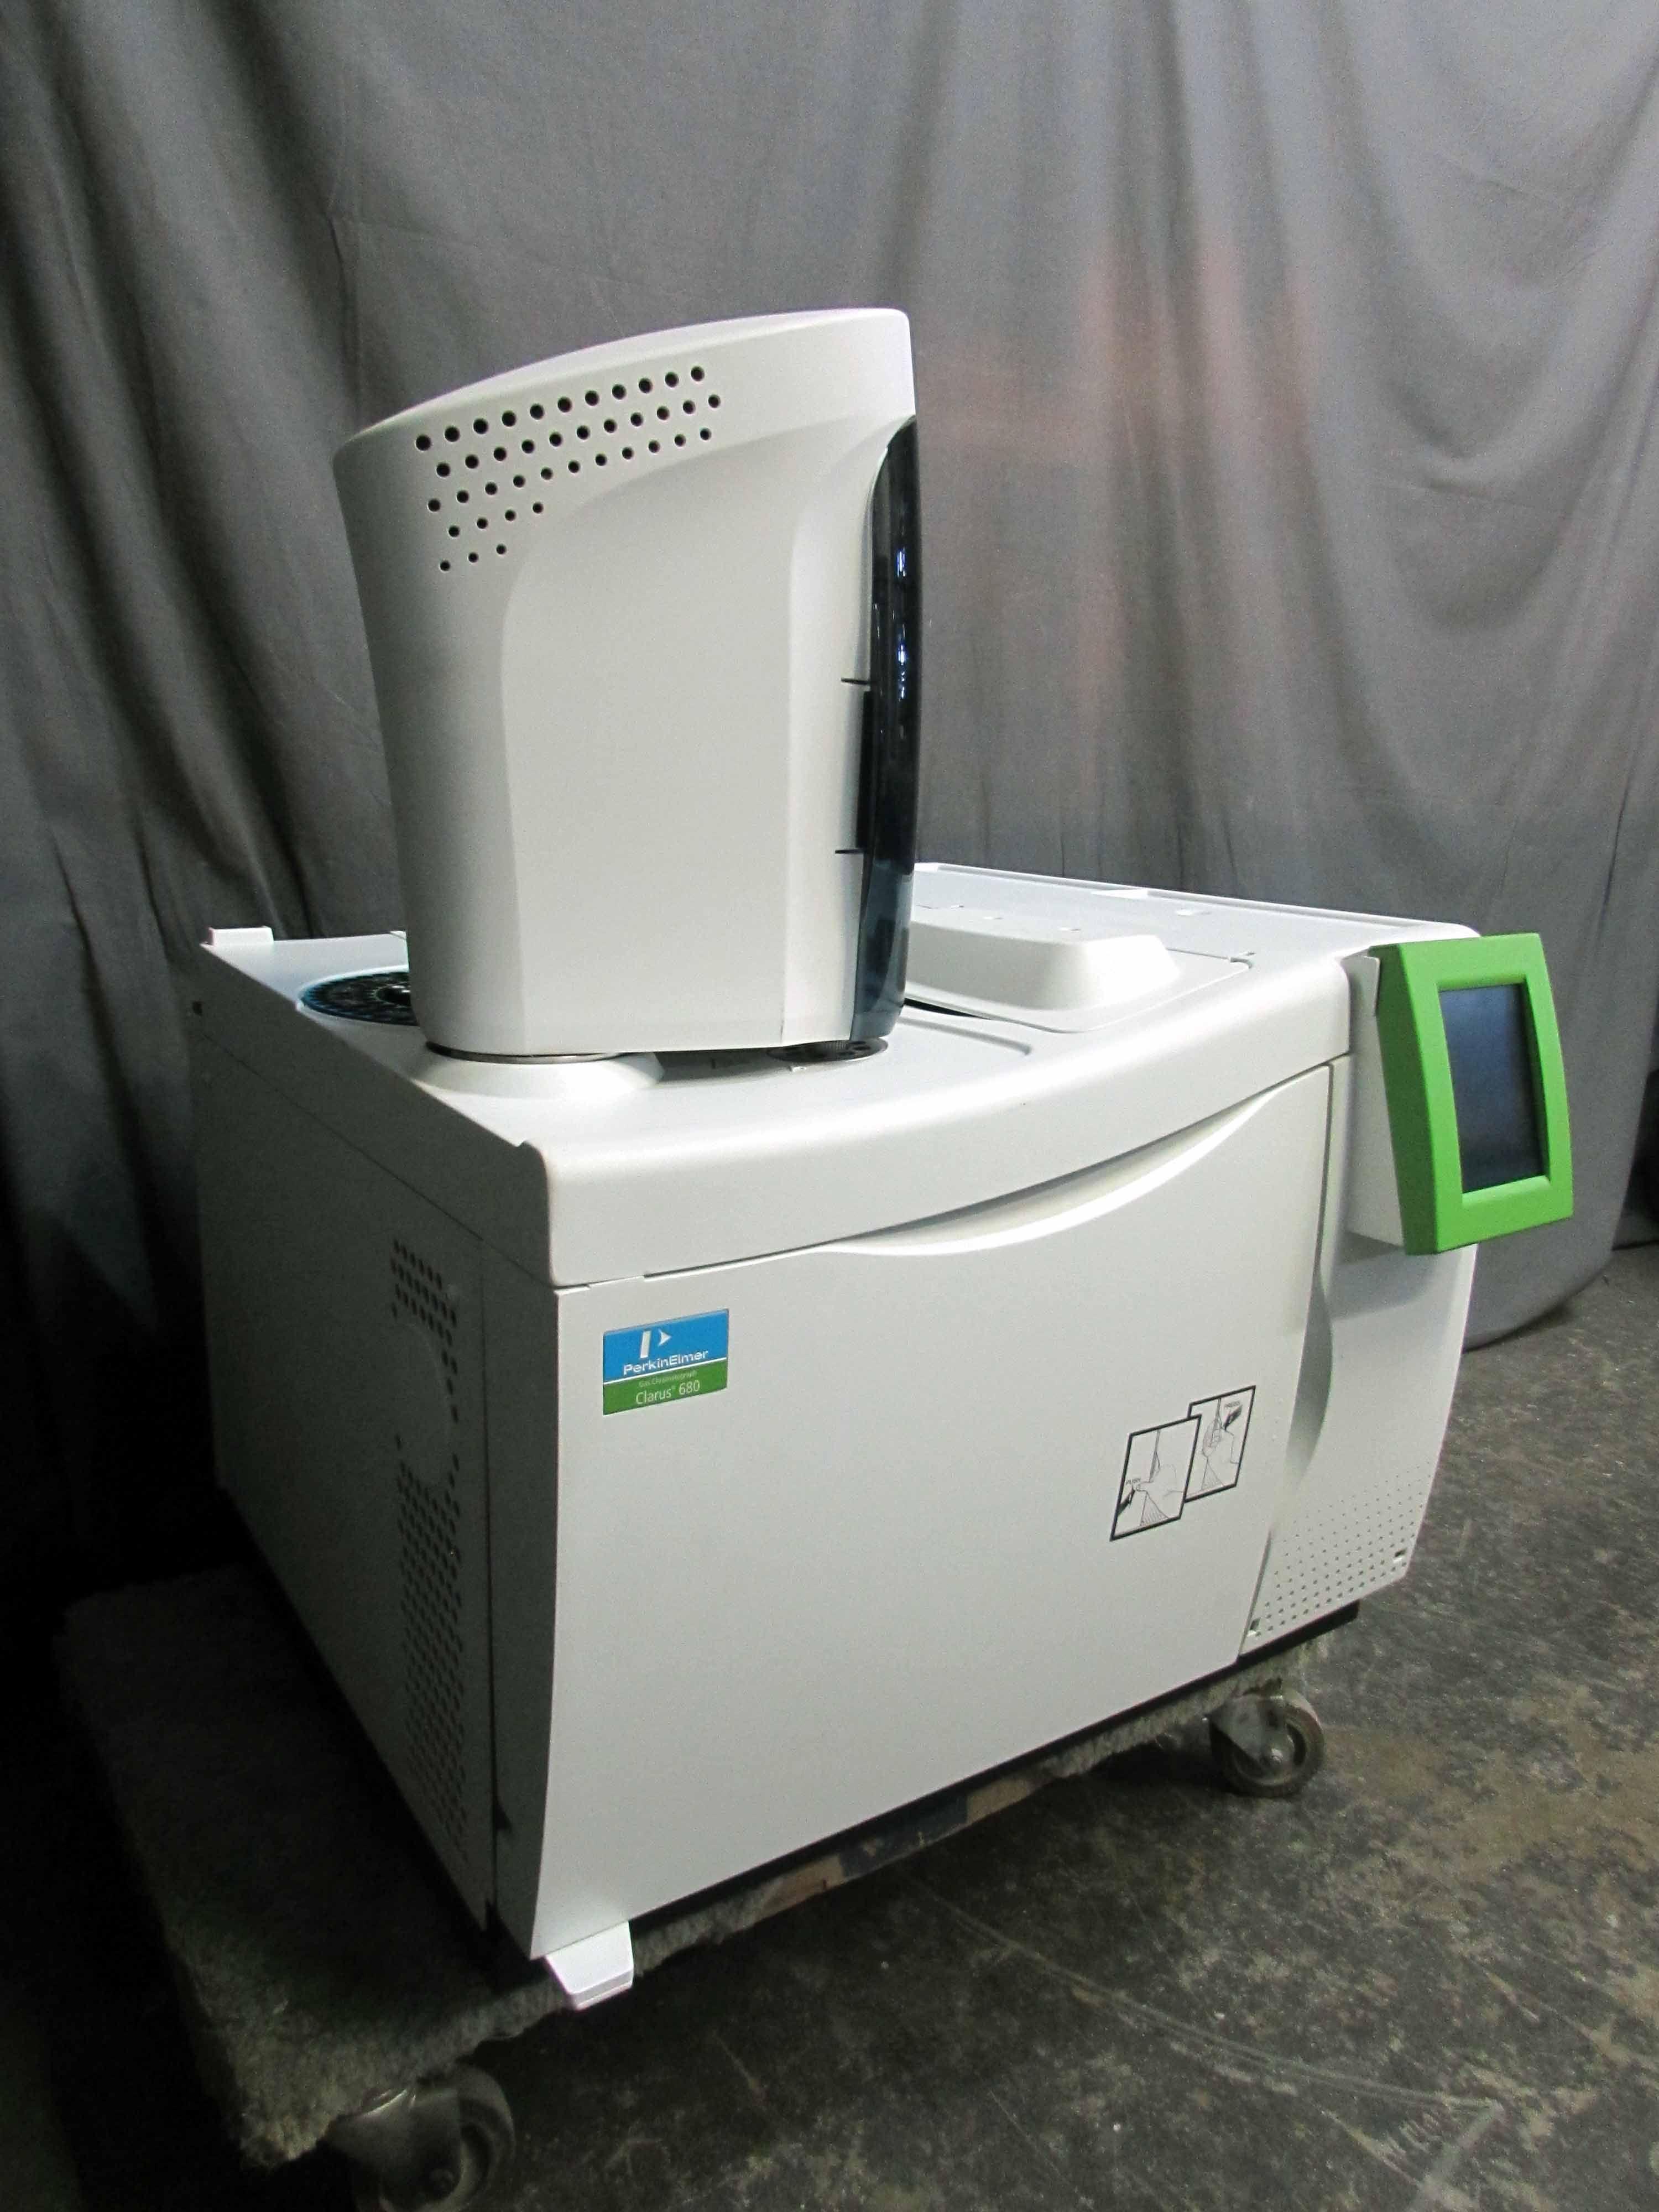 2018 Perkin Elmer Clarus 680 GC Gas Chromatograph with SW & Accessories